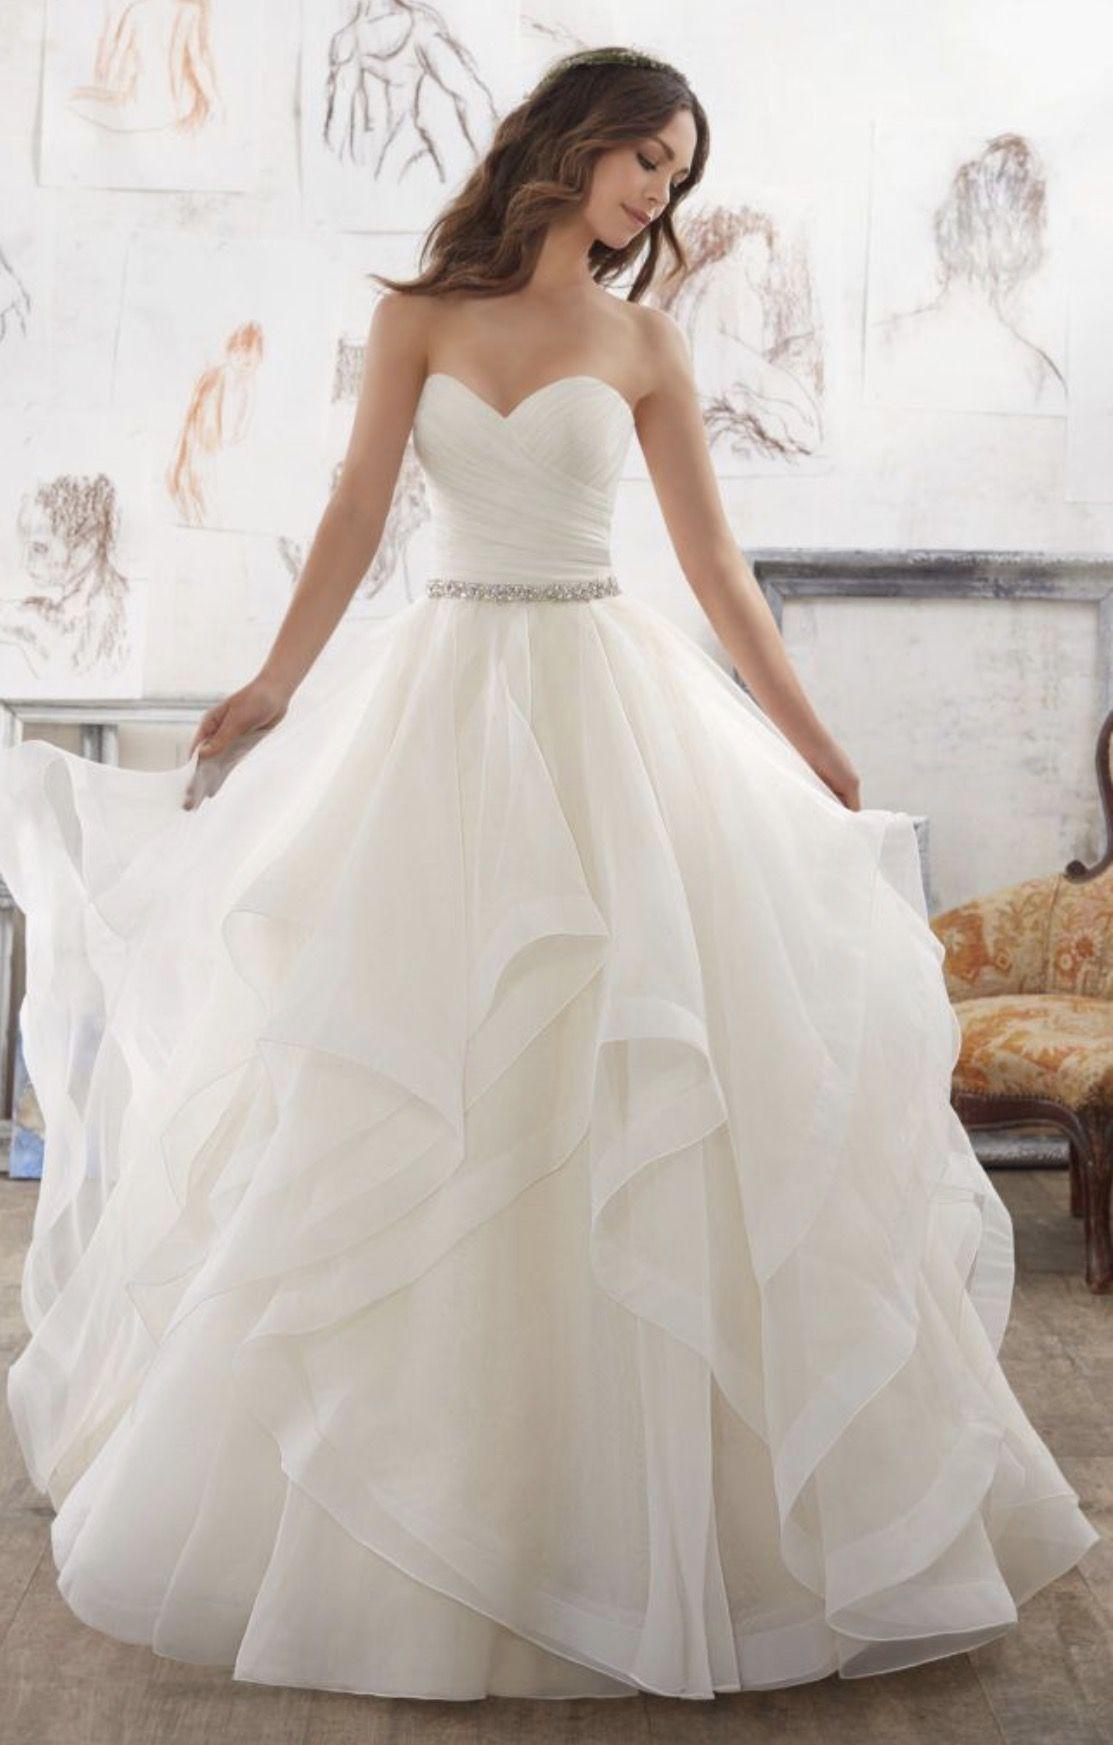 Pin by Princess on Dresses   Pinterest   Wedding dress, Wedding and ...